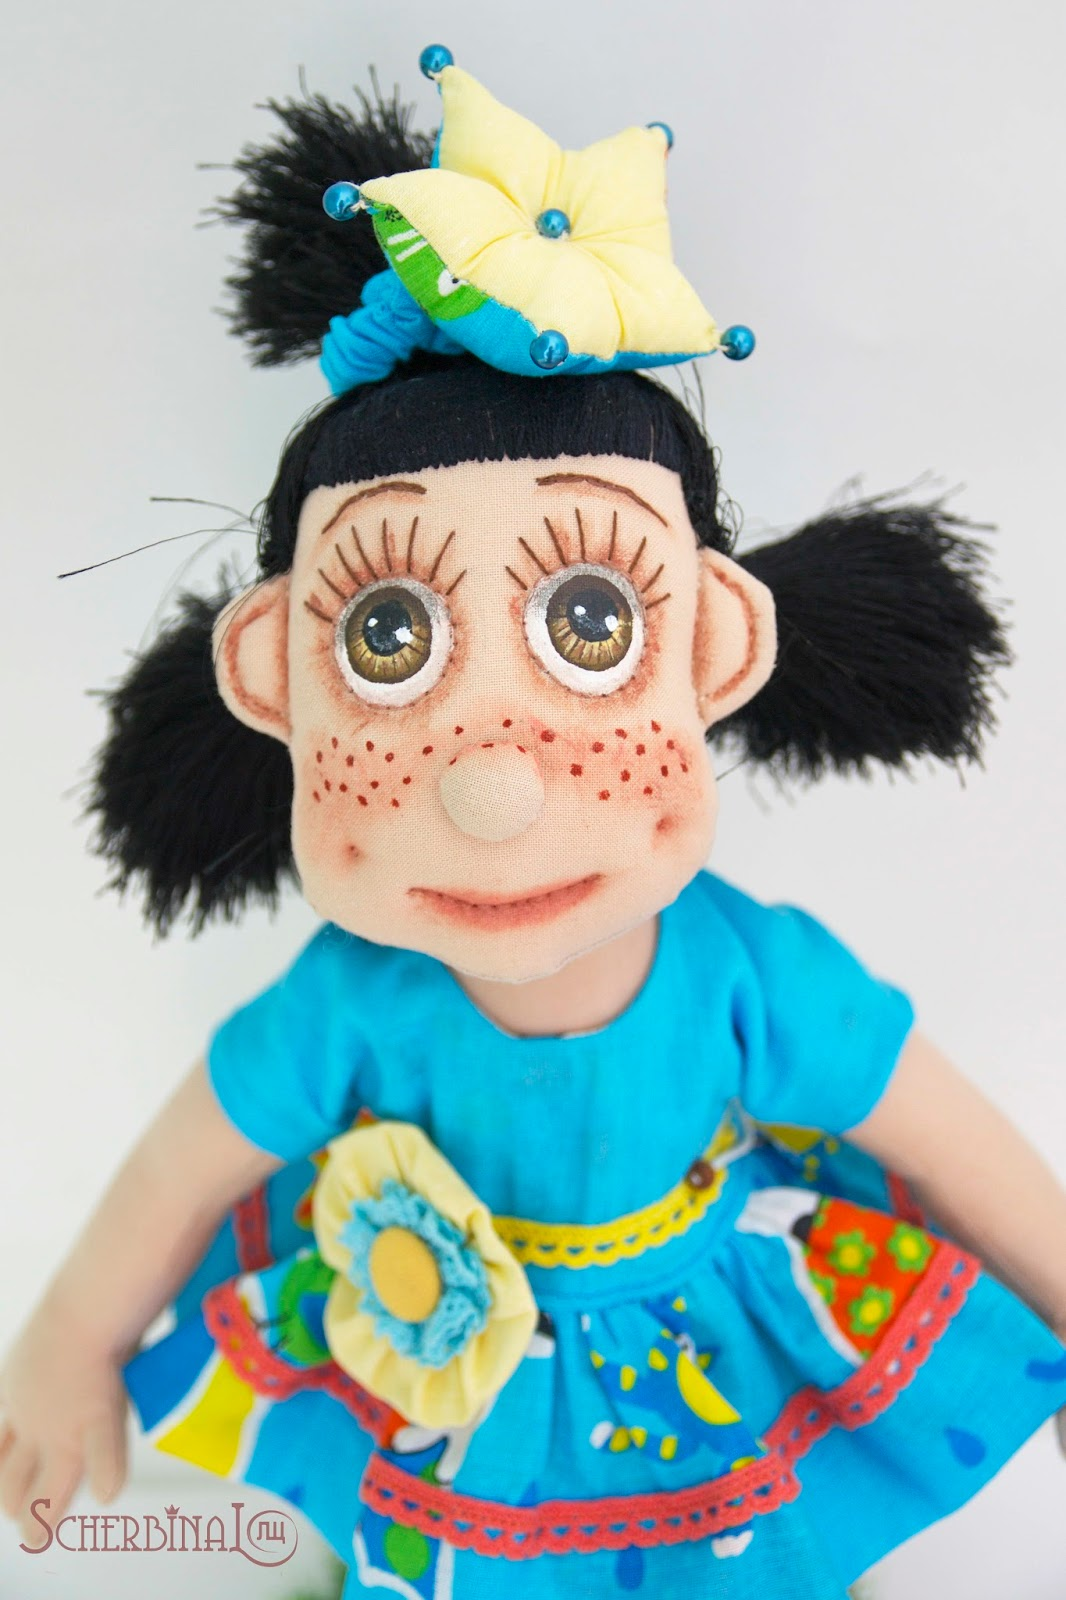 Текстильная игровая кукла-карамелька принцесса Рая. Ручная работа